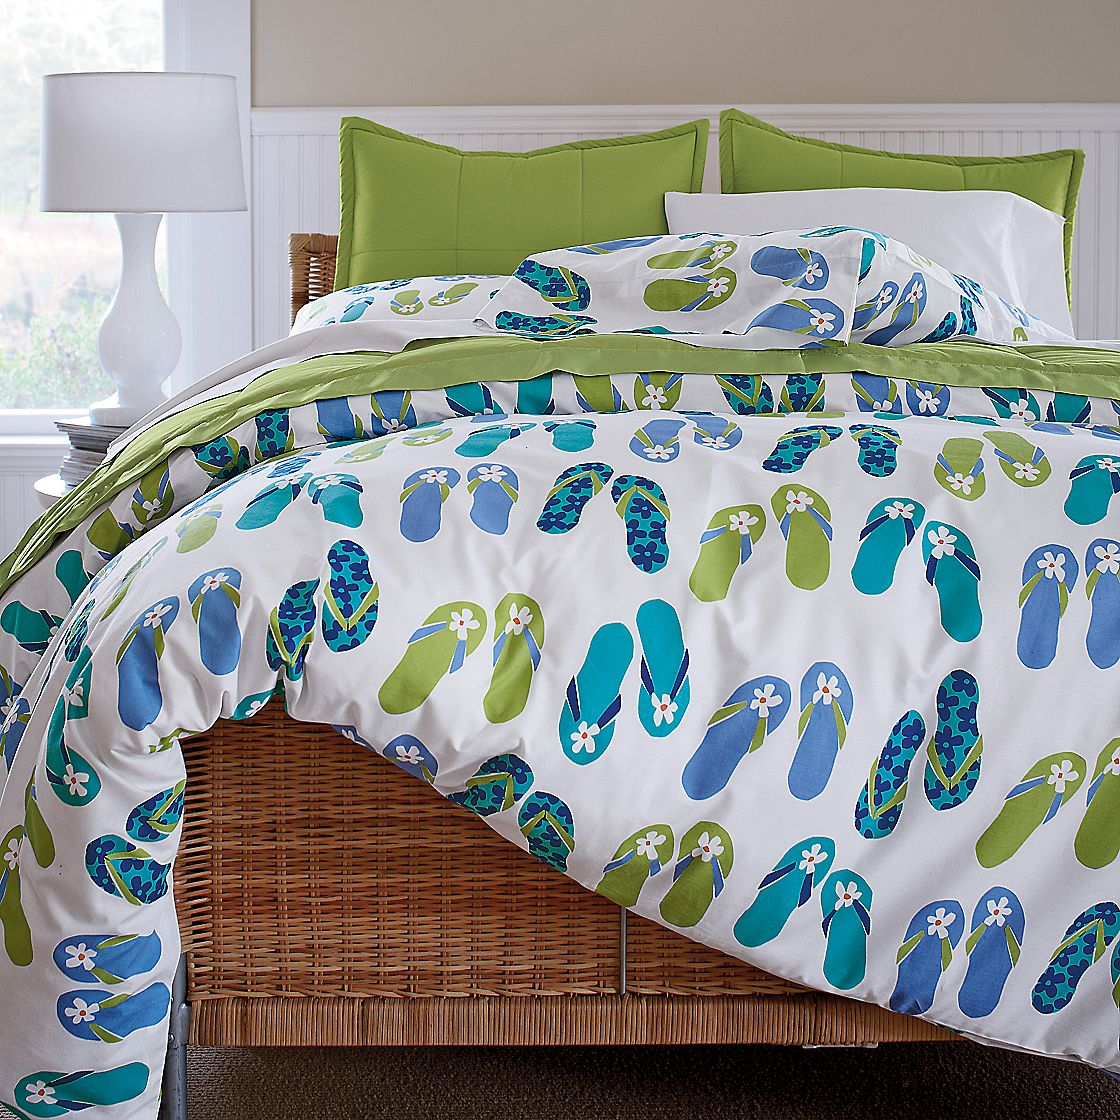 Beach bedding on Pinterest | Beach Theme Bedding, The ...